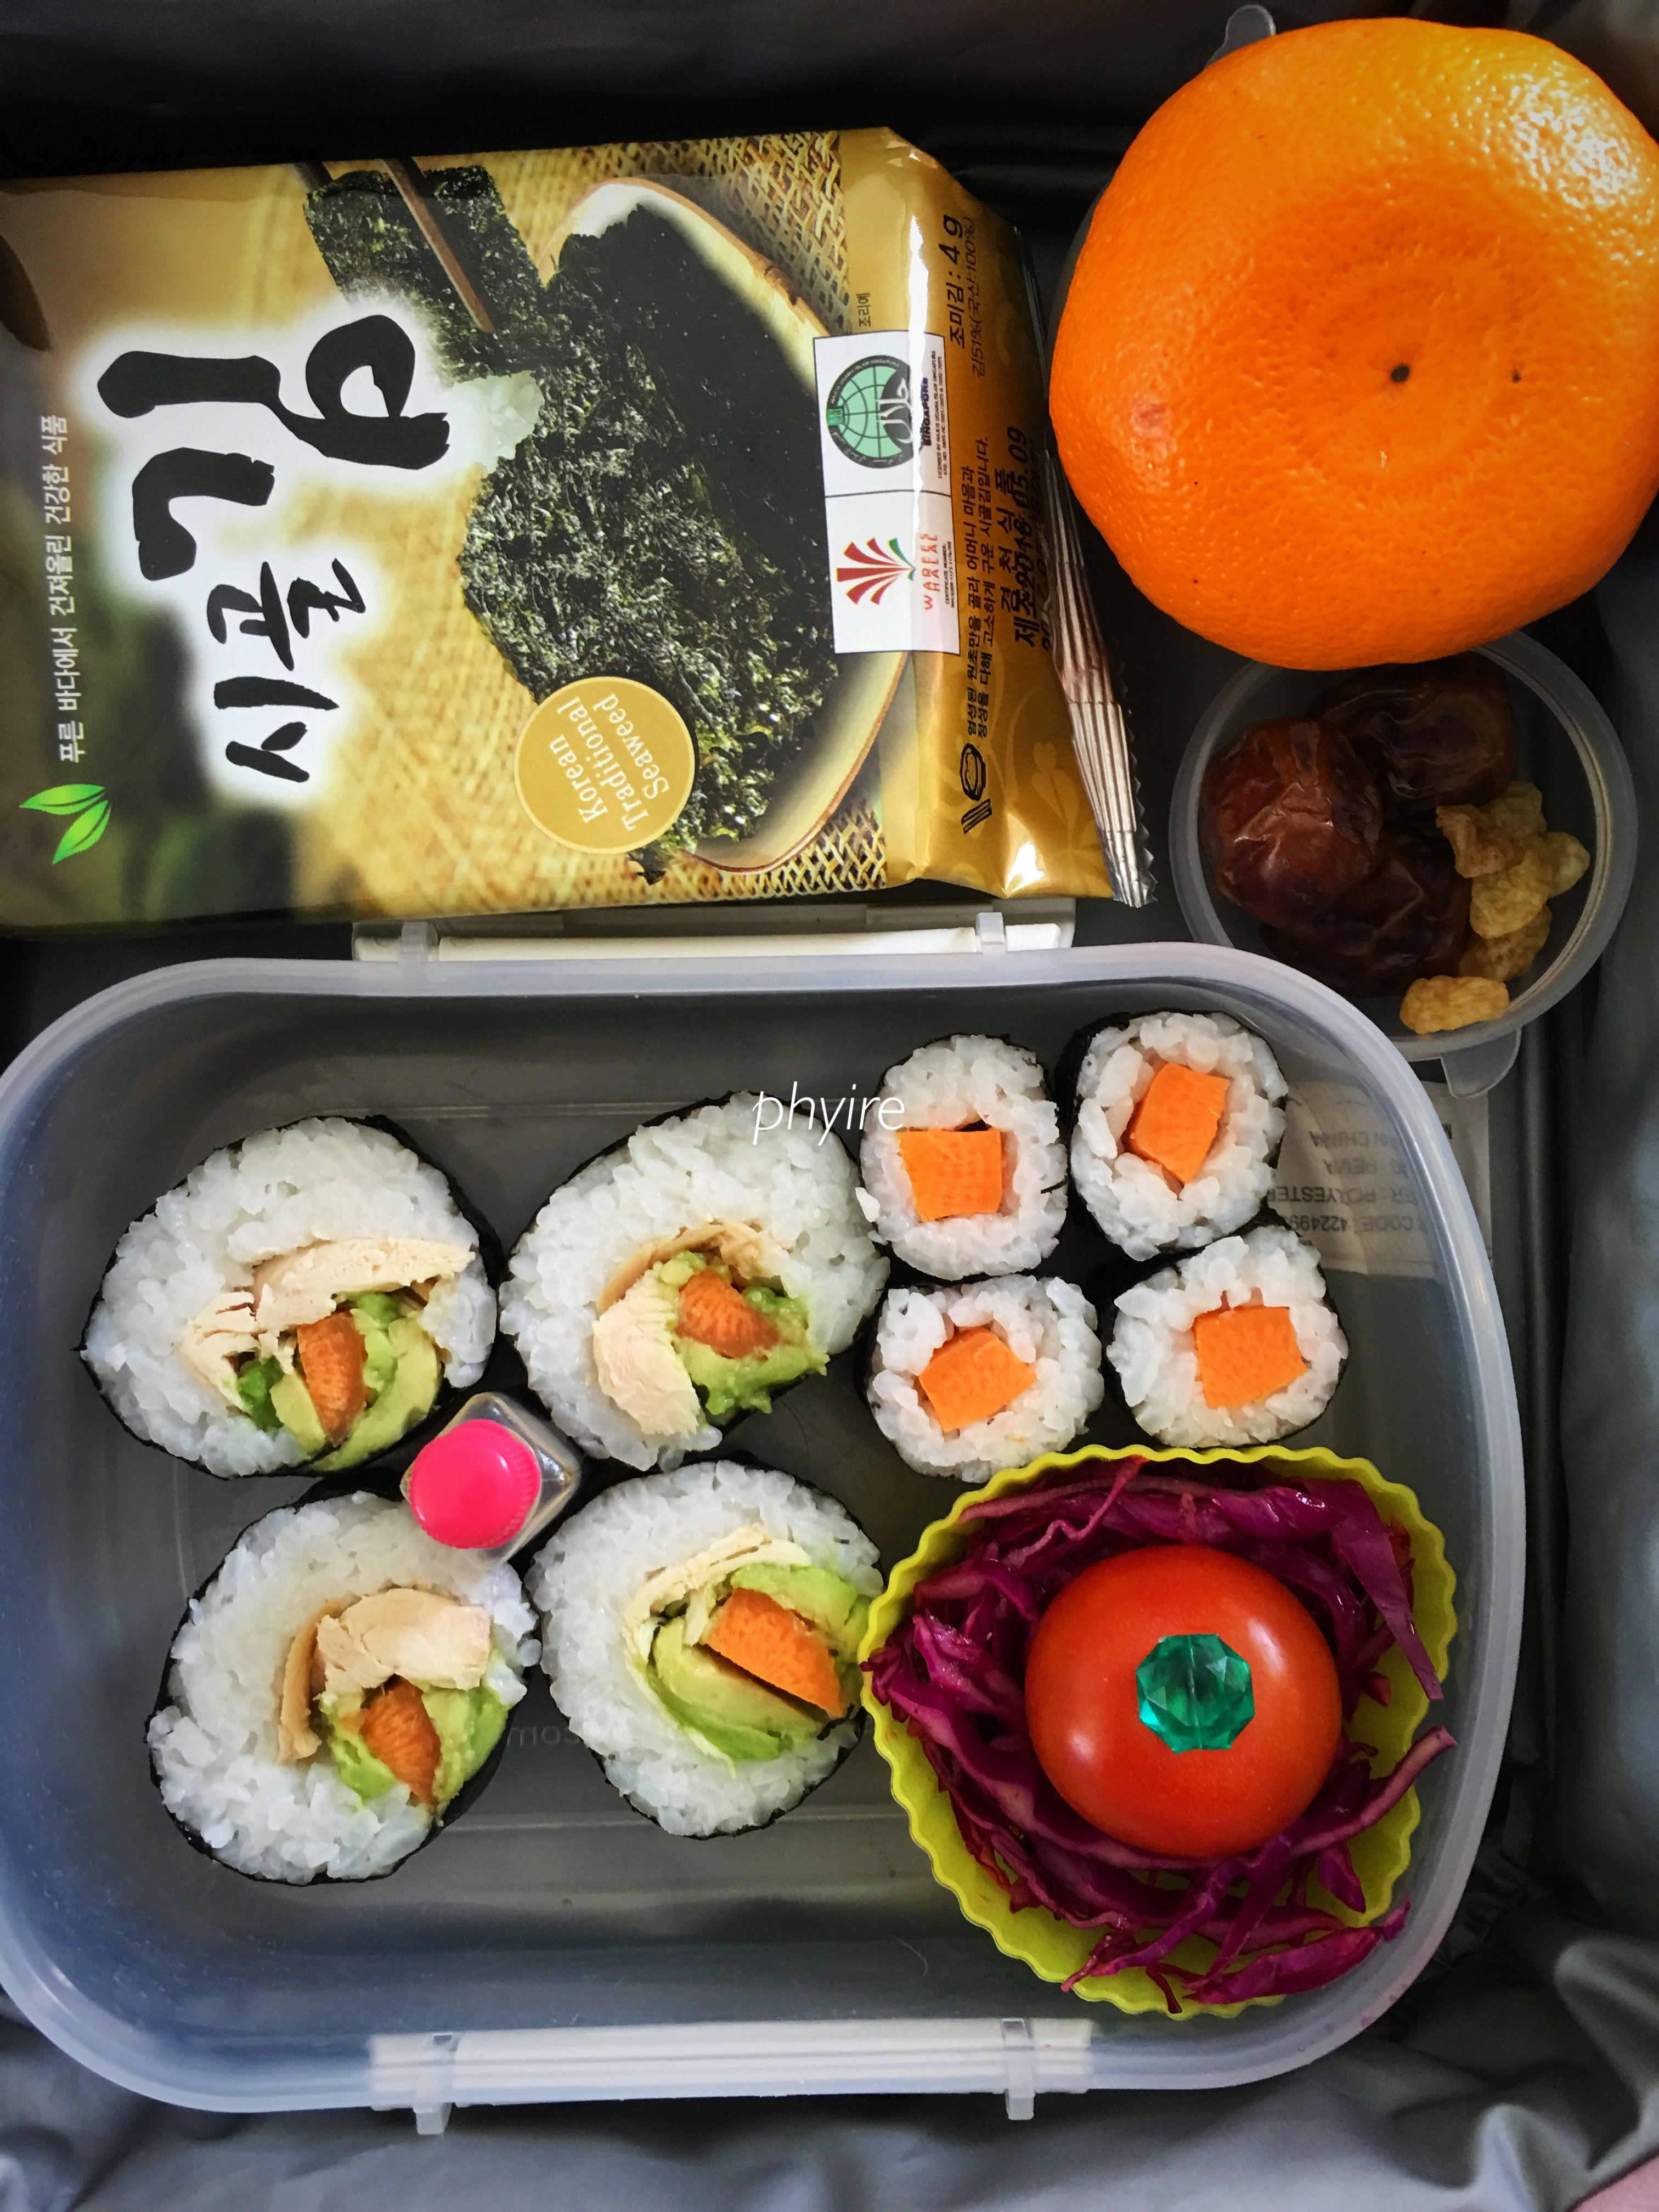 #lunchbox Avocado, carrot, chicken futomaki, carrot hosomaki, red cabbage & tomato salad, nori, mandarin, dates, raisins